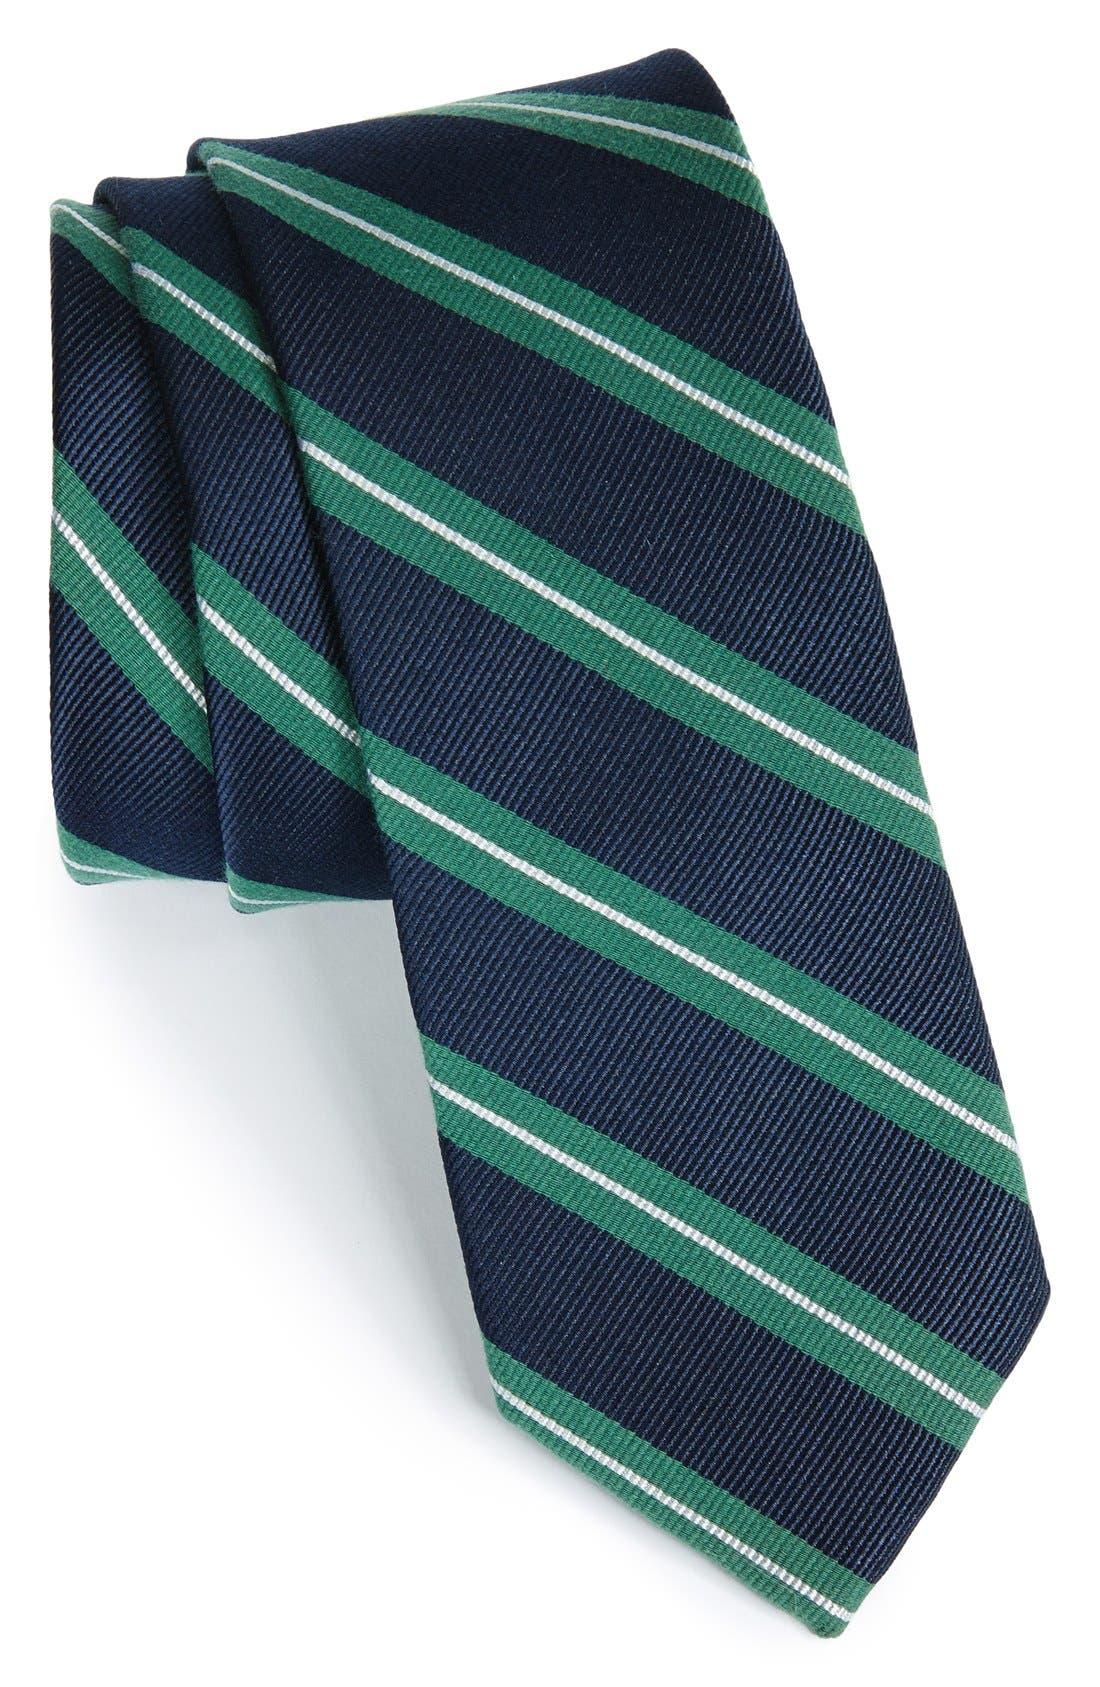 Alternate Image 1 Selected - 1901 'Morrison Stripe' Woven Silk & Cotton Tie